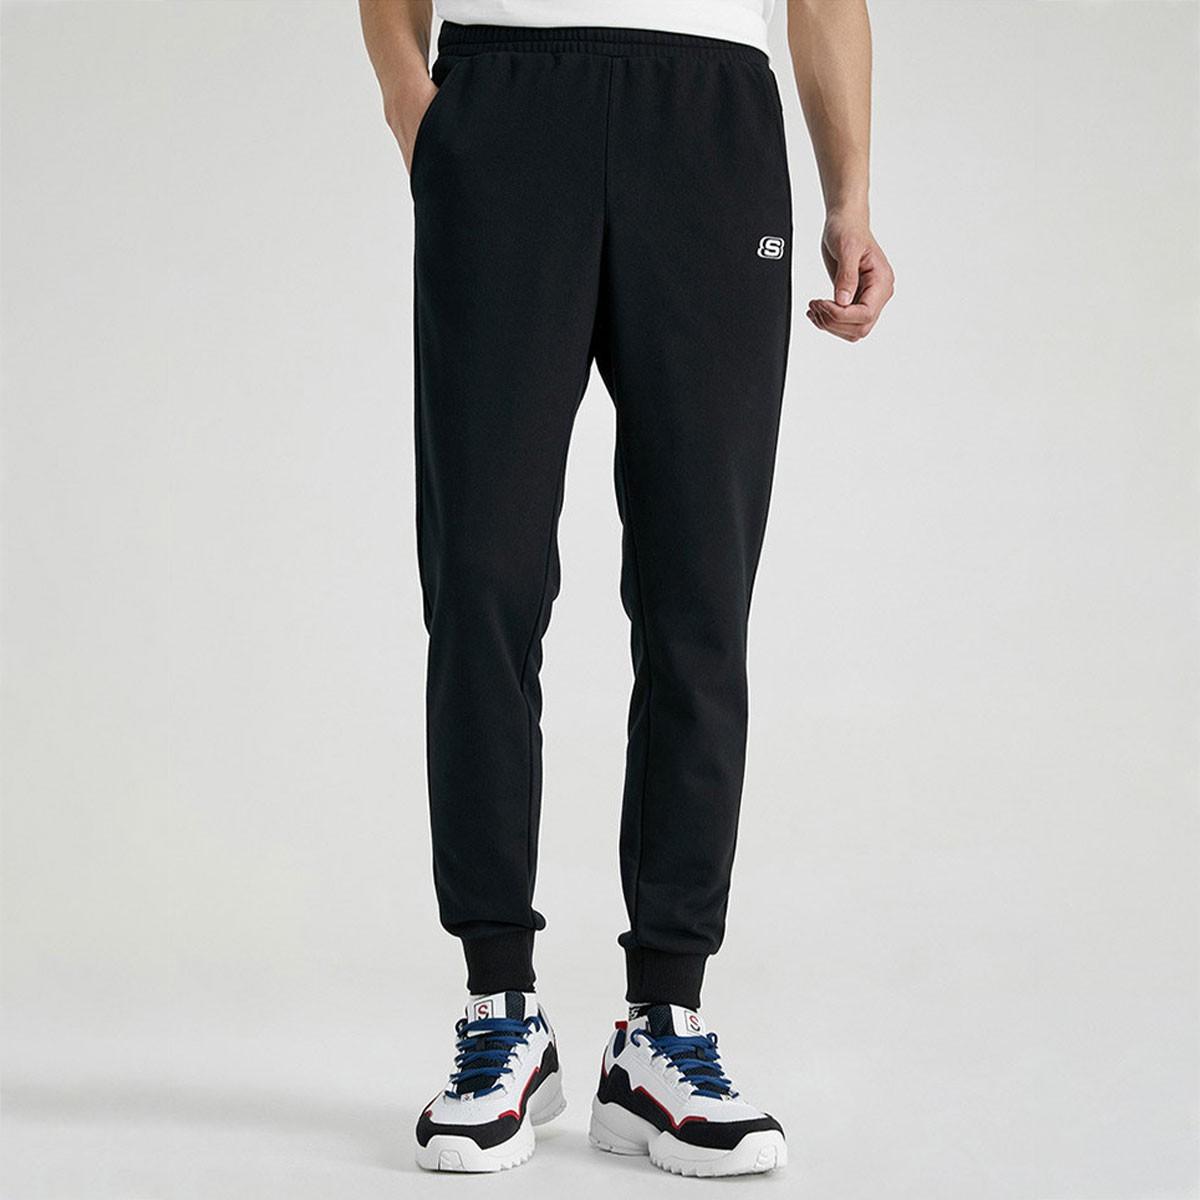 SKECHERS 斯凯奇 L220M195-0018 男子束脚裤